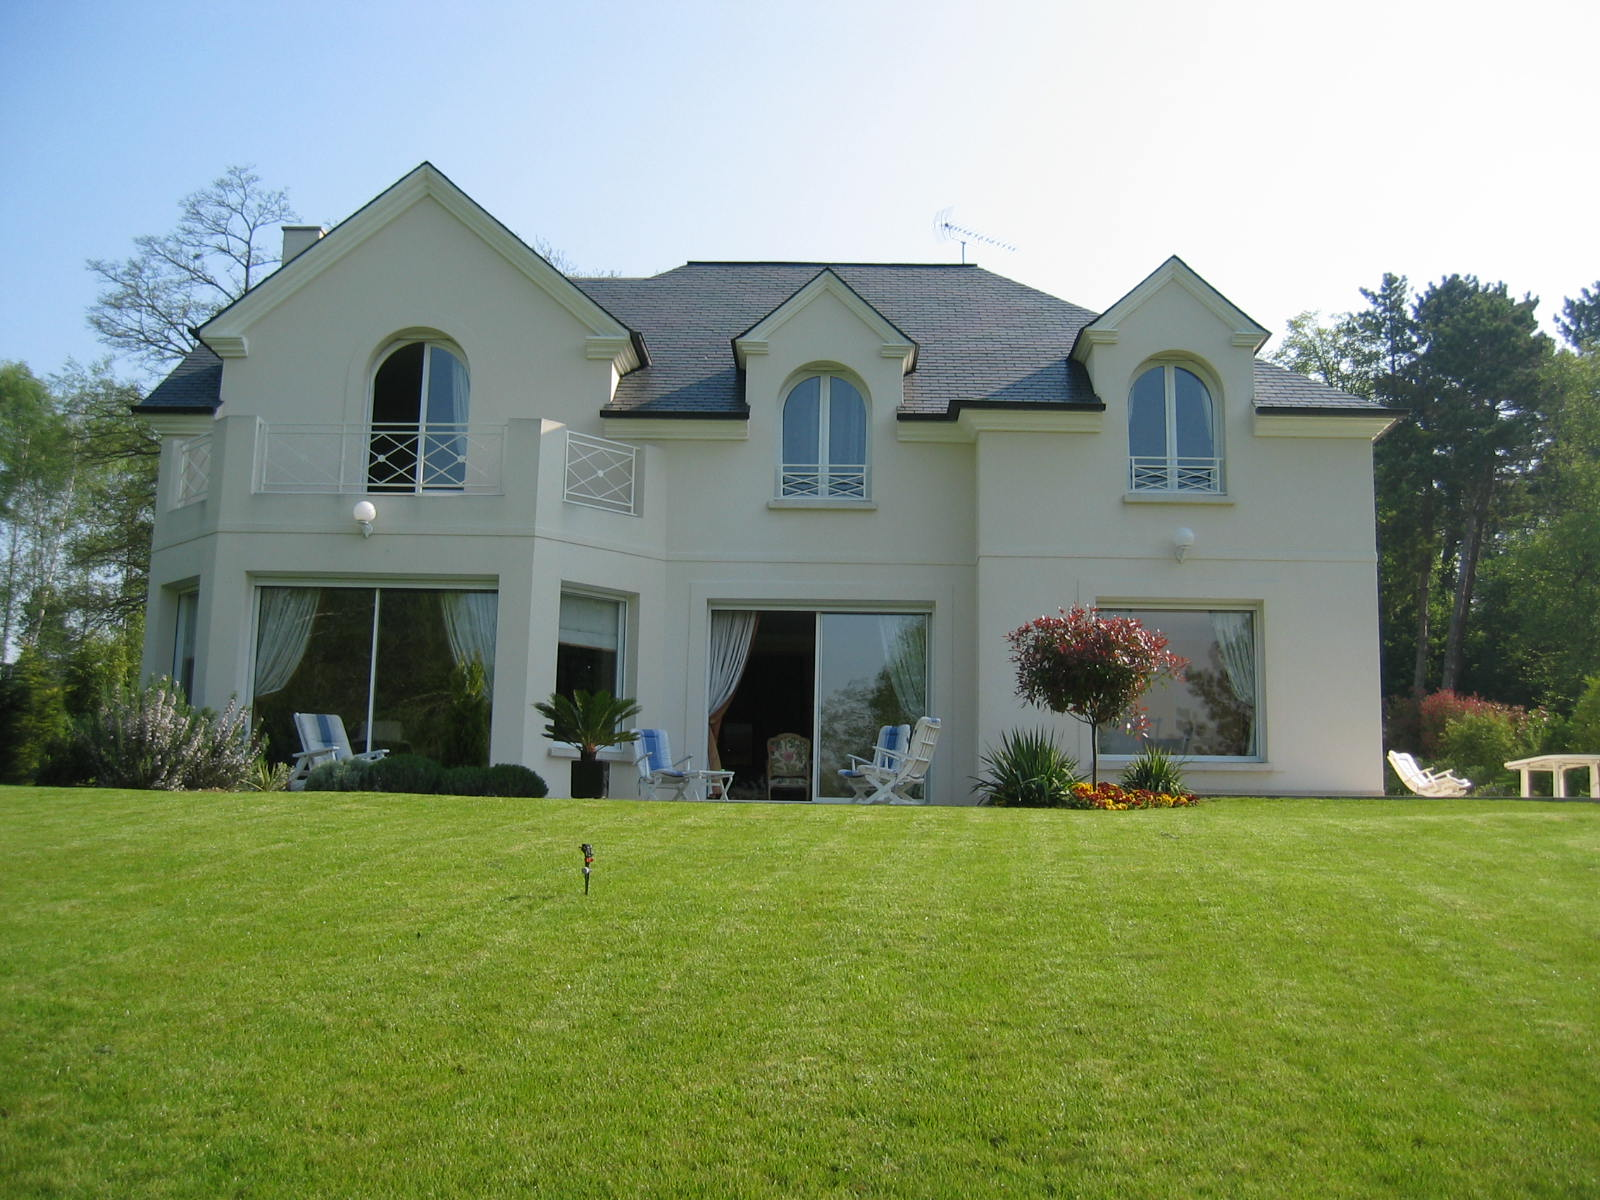 So villas constructeurs de france for Villa constructeur